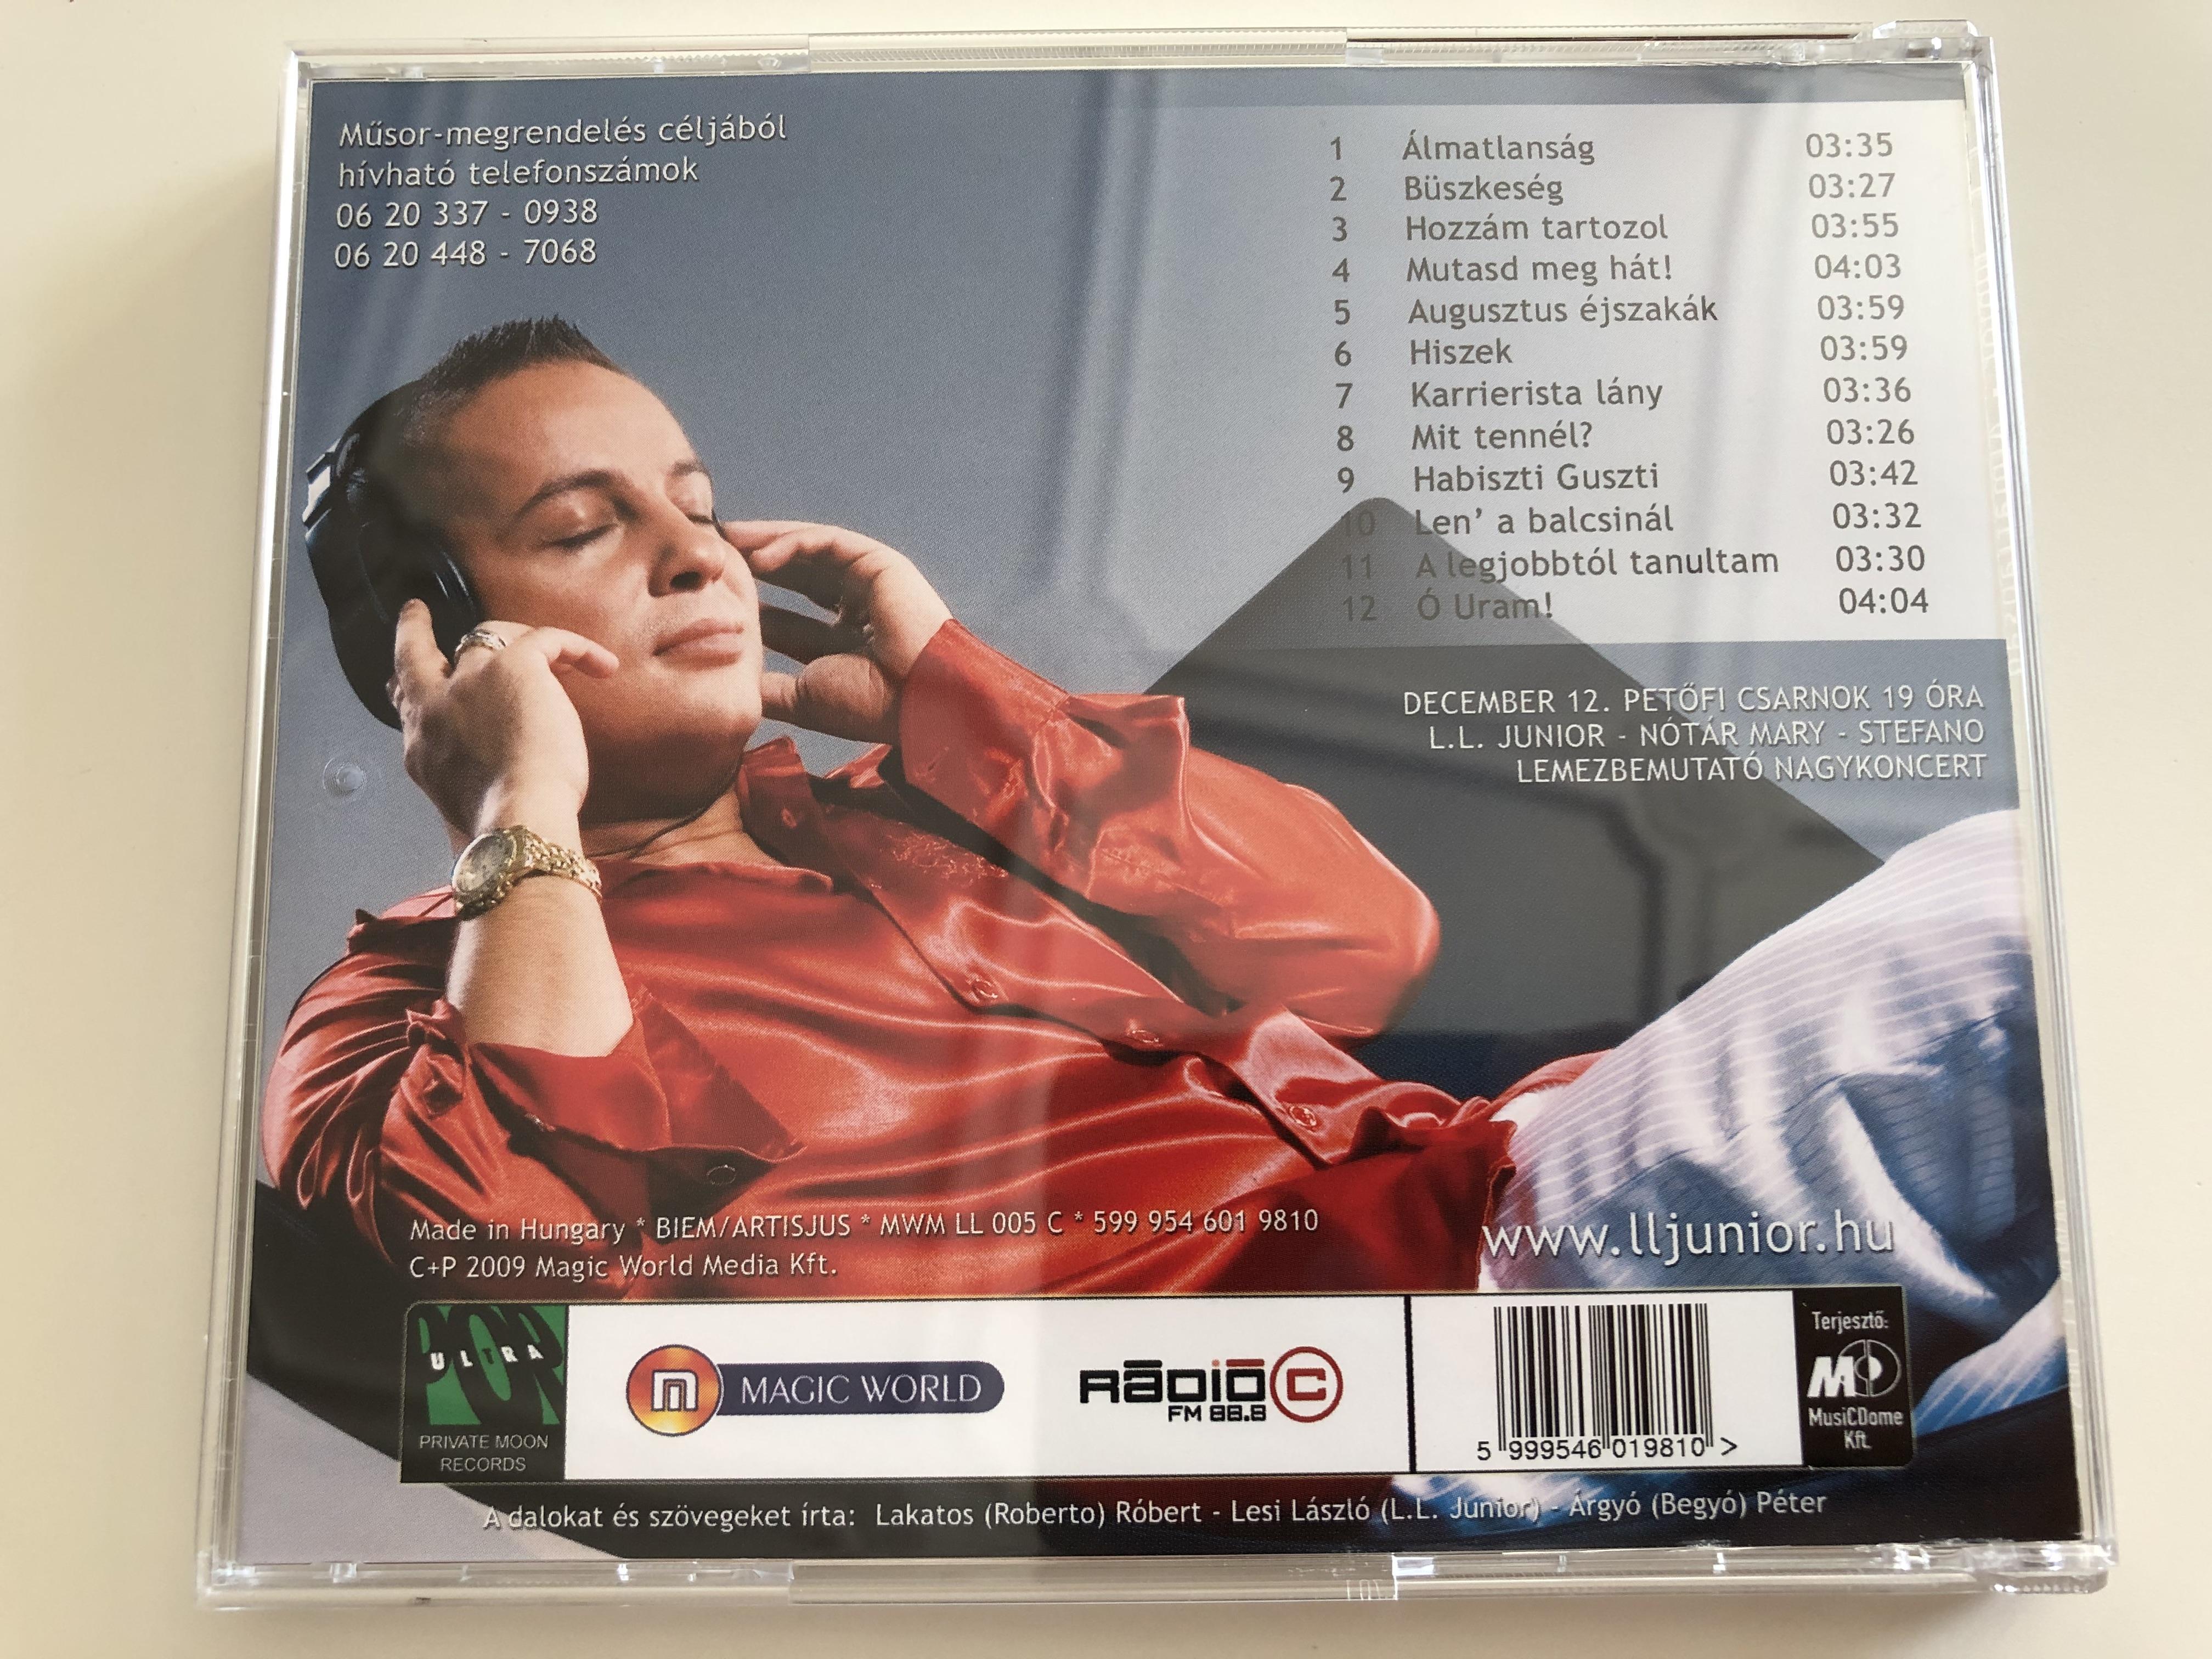 l.l.-junior-lmatlans-g-l.l.-junior-n-t-r-mary-stefano-audio-cd-2009-album-premiere-concert-recorded-on-december-12th-2009-mwm-ll-005-c-5-.jpg